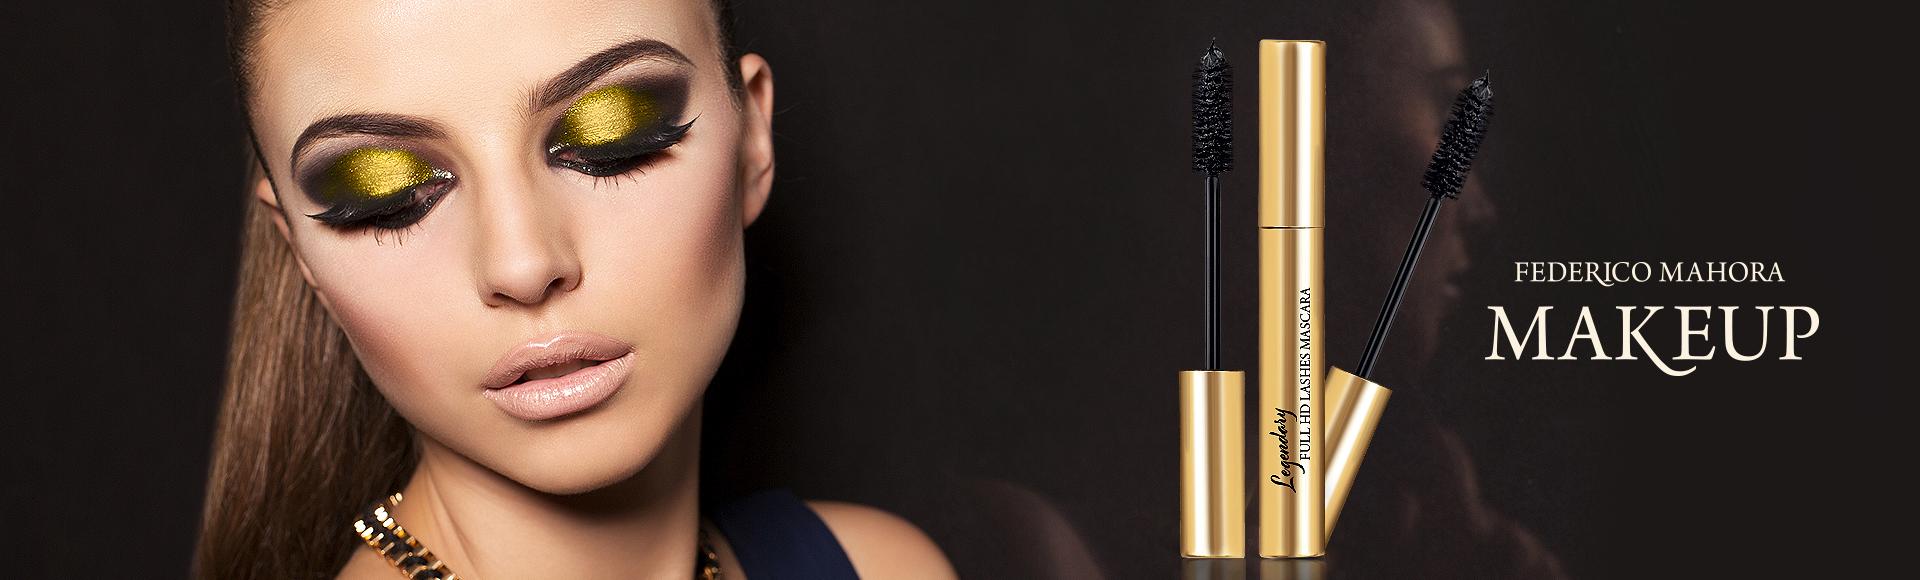 Make-up-Augen-Federico-Mahora